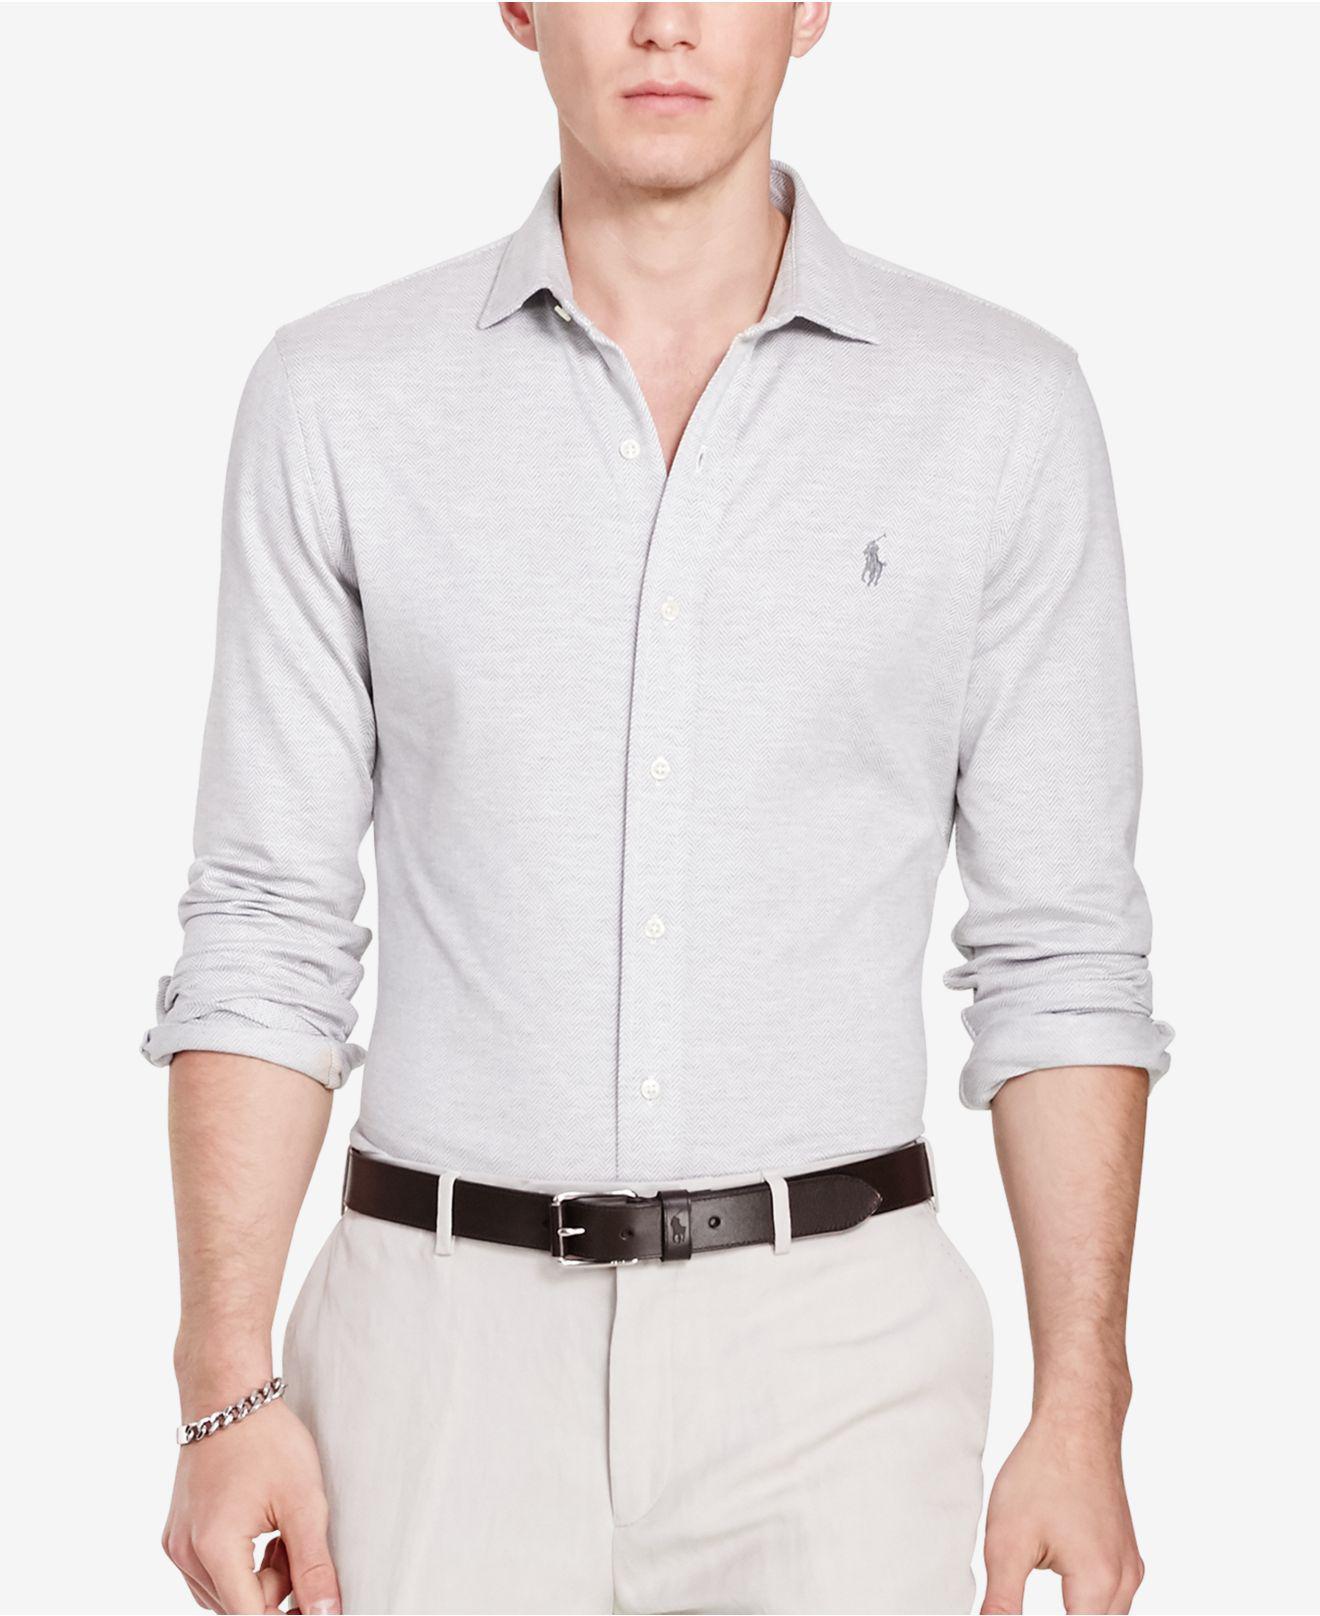 Men's Herringbone Knit Dress Shirt